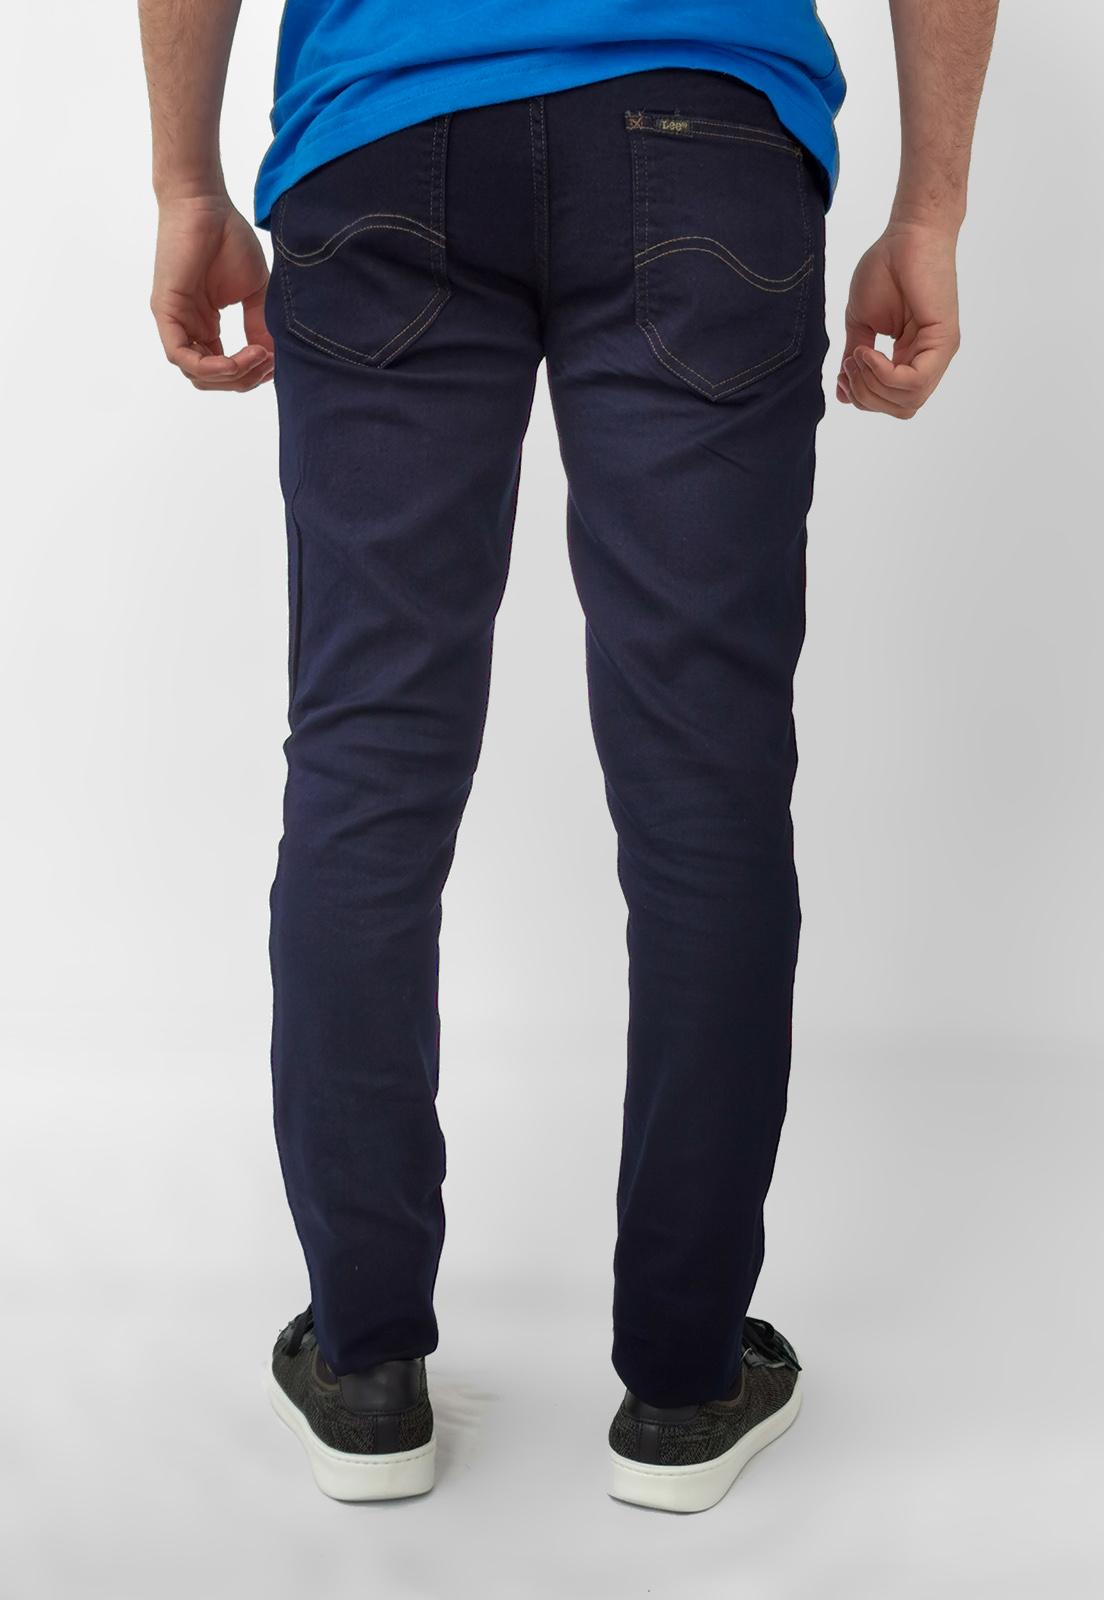 Calça Jeans Lee Skinny Azul Marinho